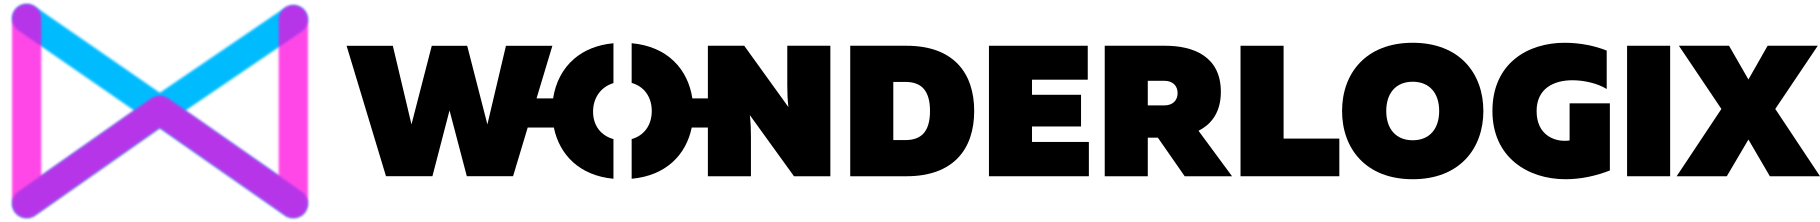 WONDERLOGIX logo